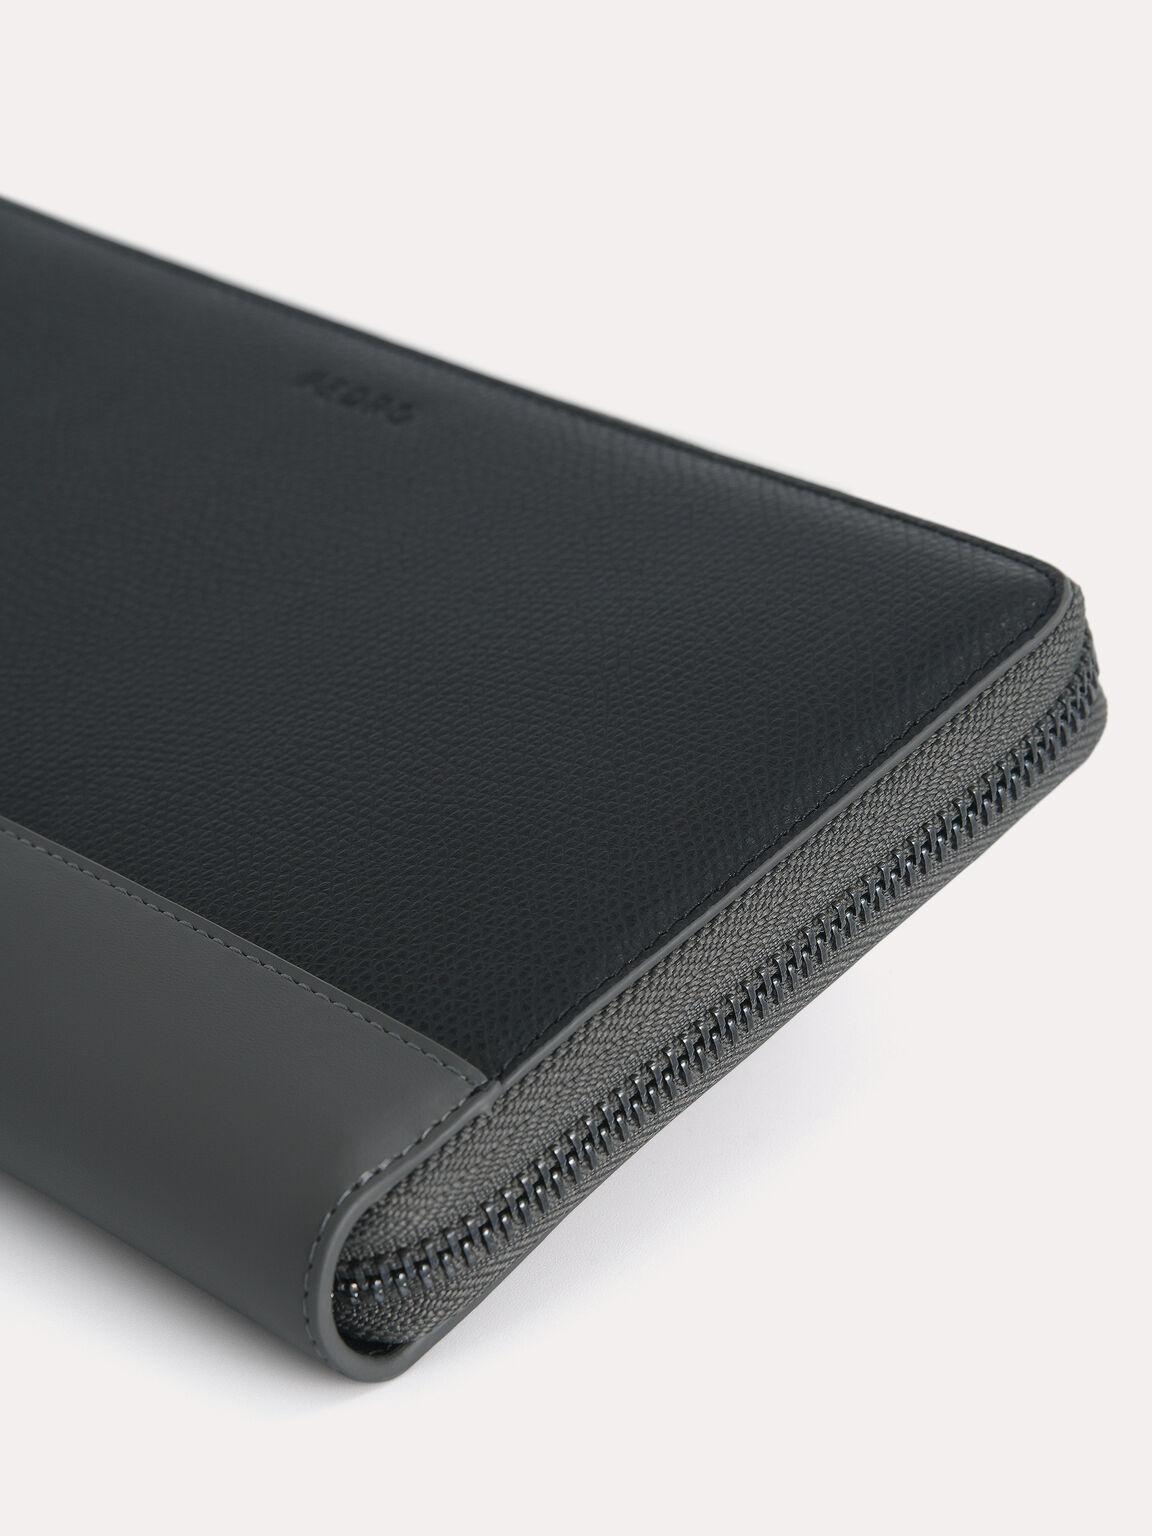 Textured Leather Travel Organiser, Black, hi-res